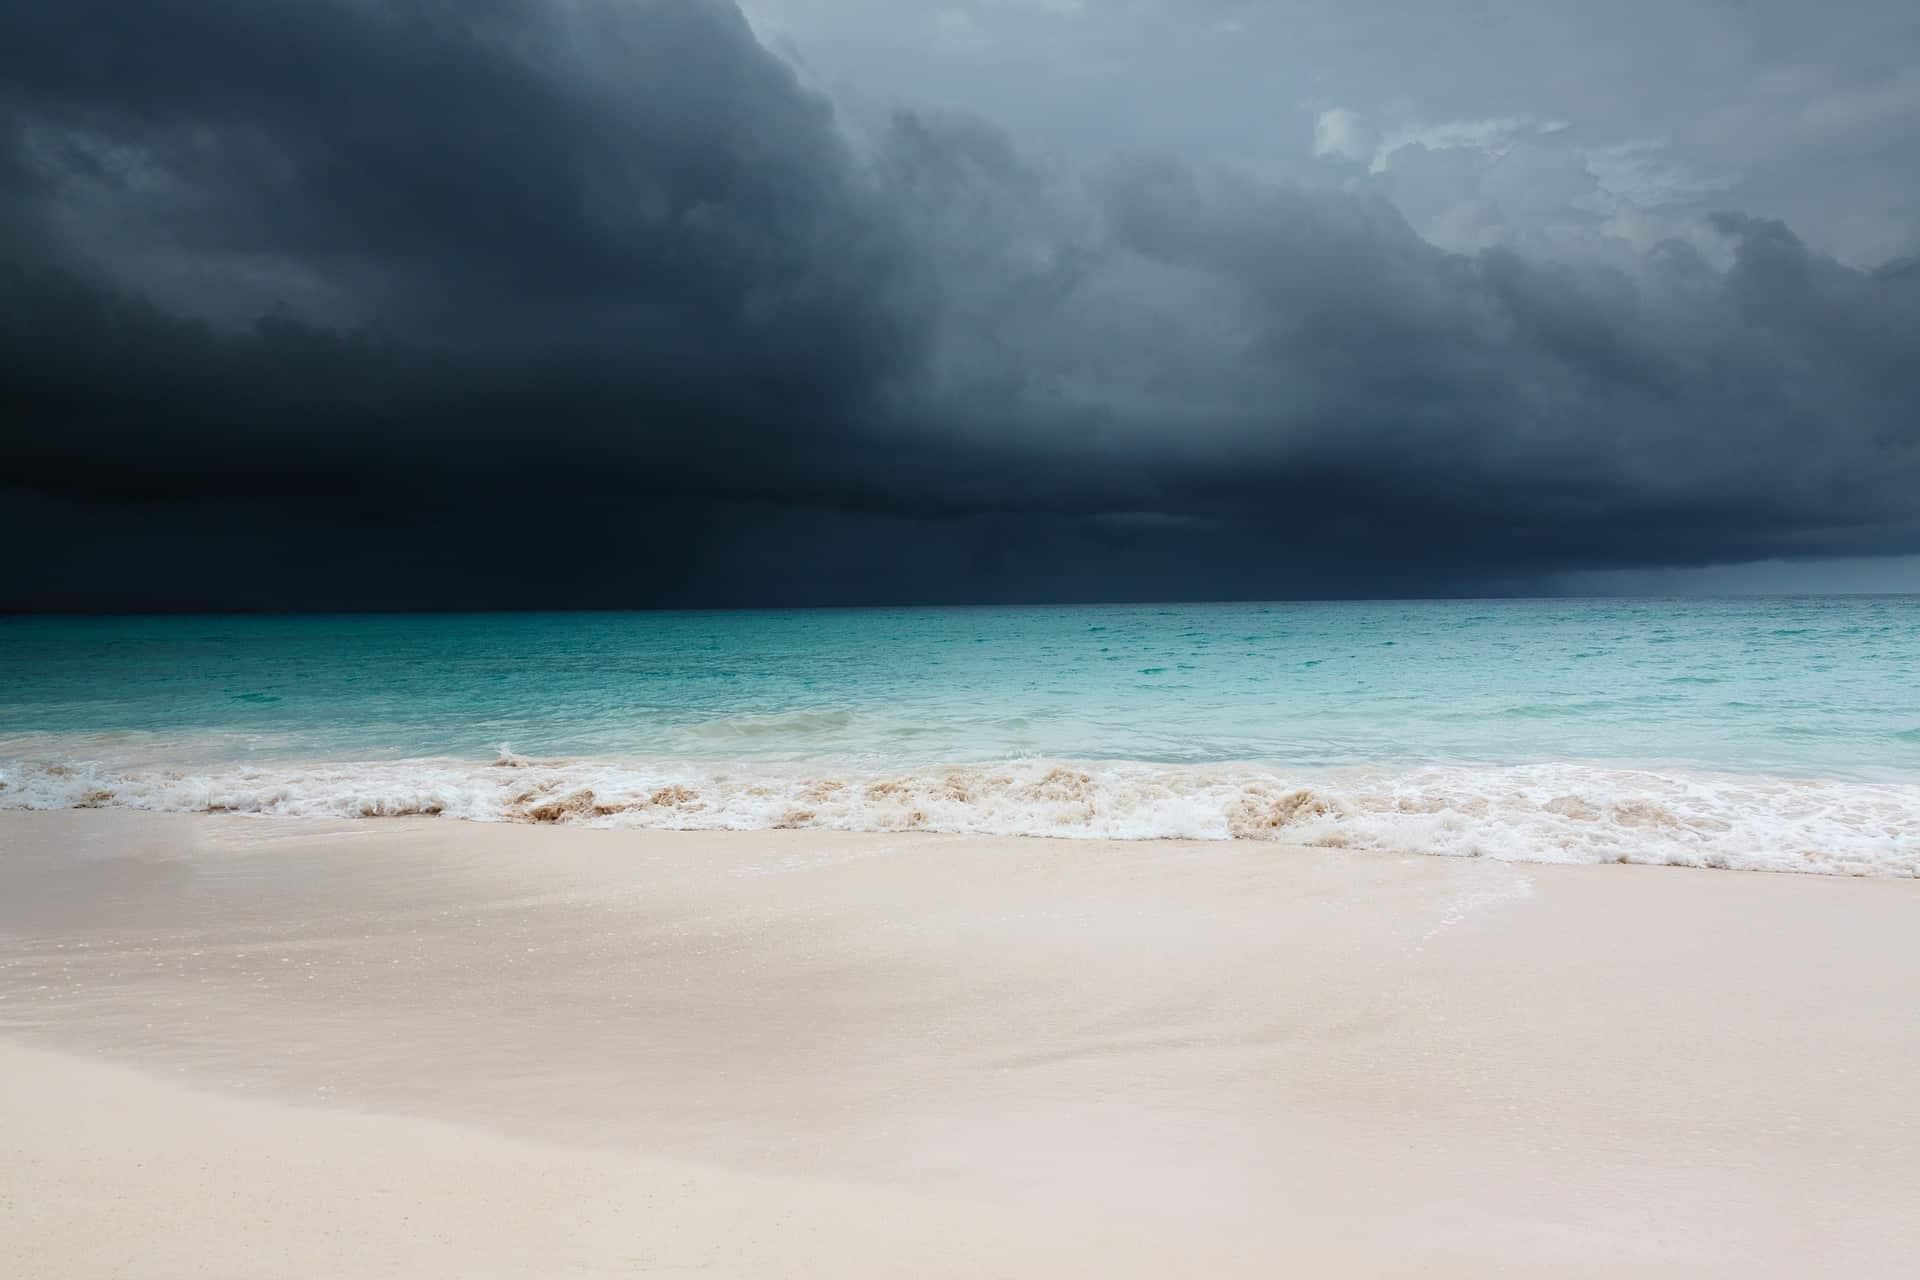 storm beach clouds ocean